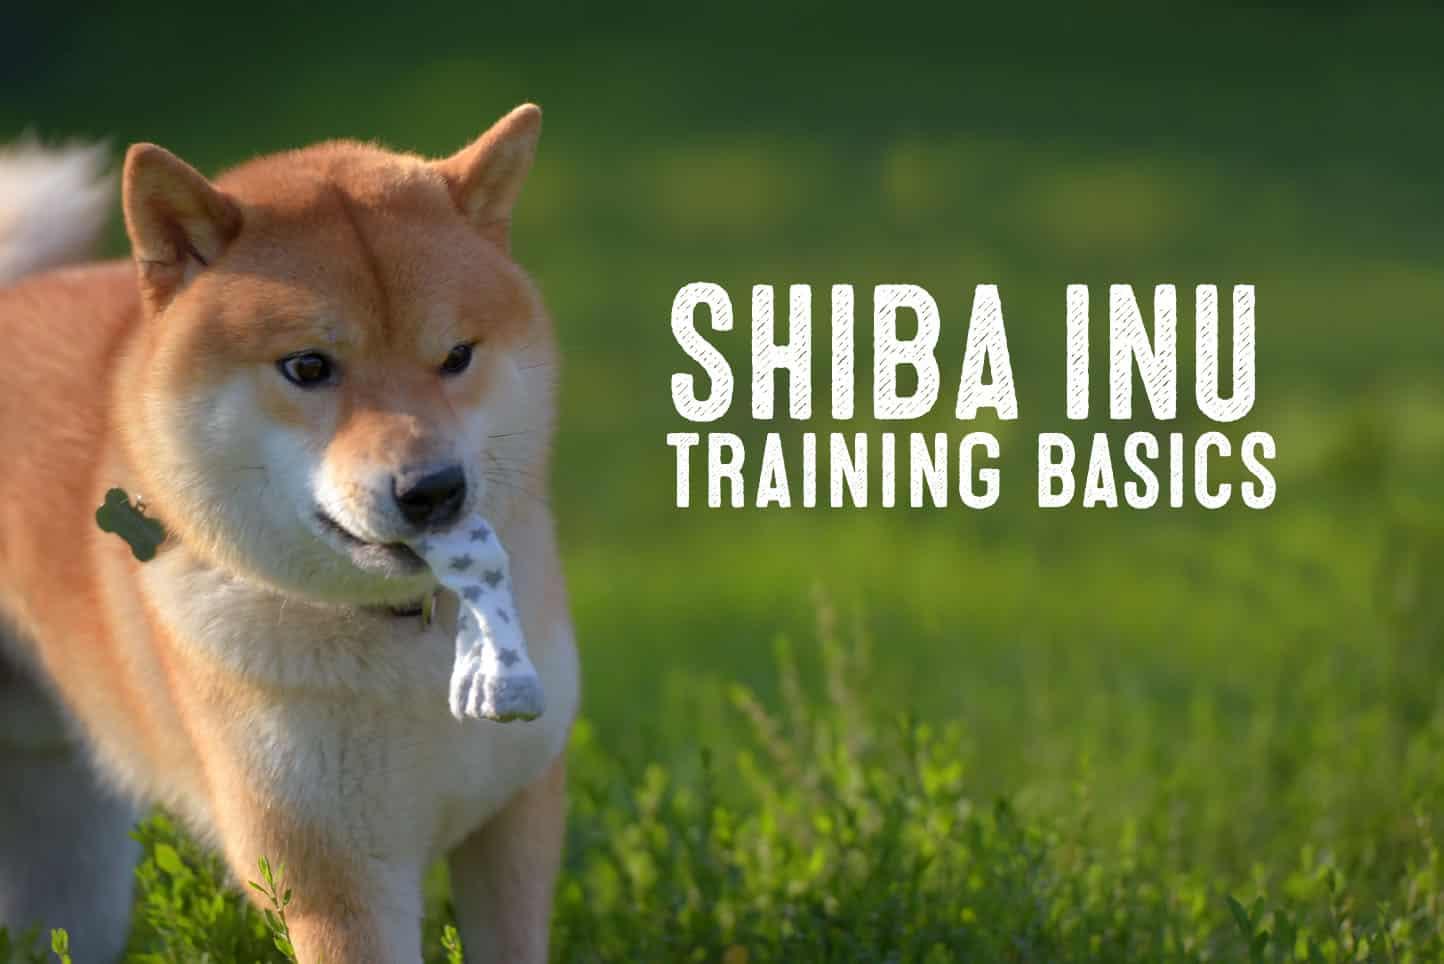 shiba inu training basics